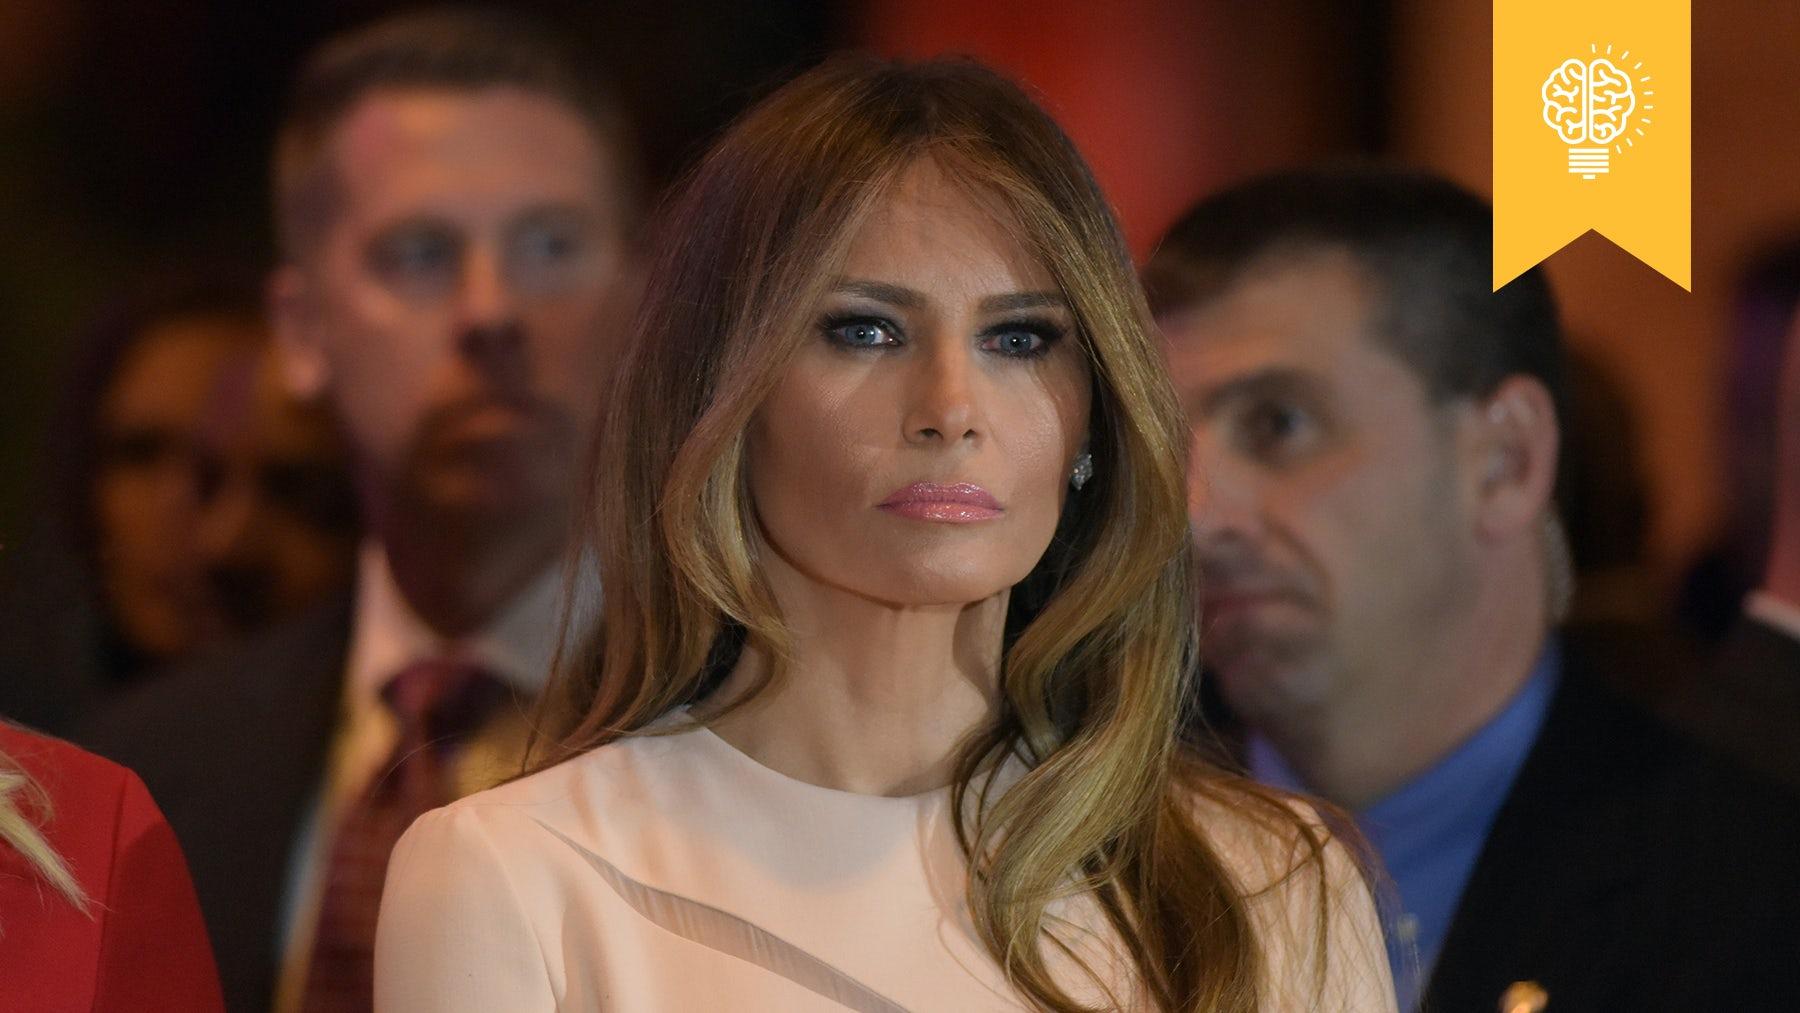 Melania Trump | Source: Shutterstock